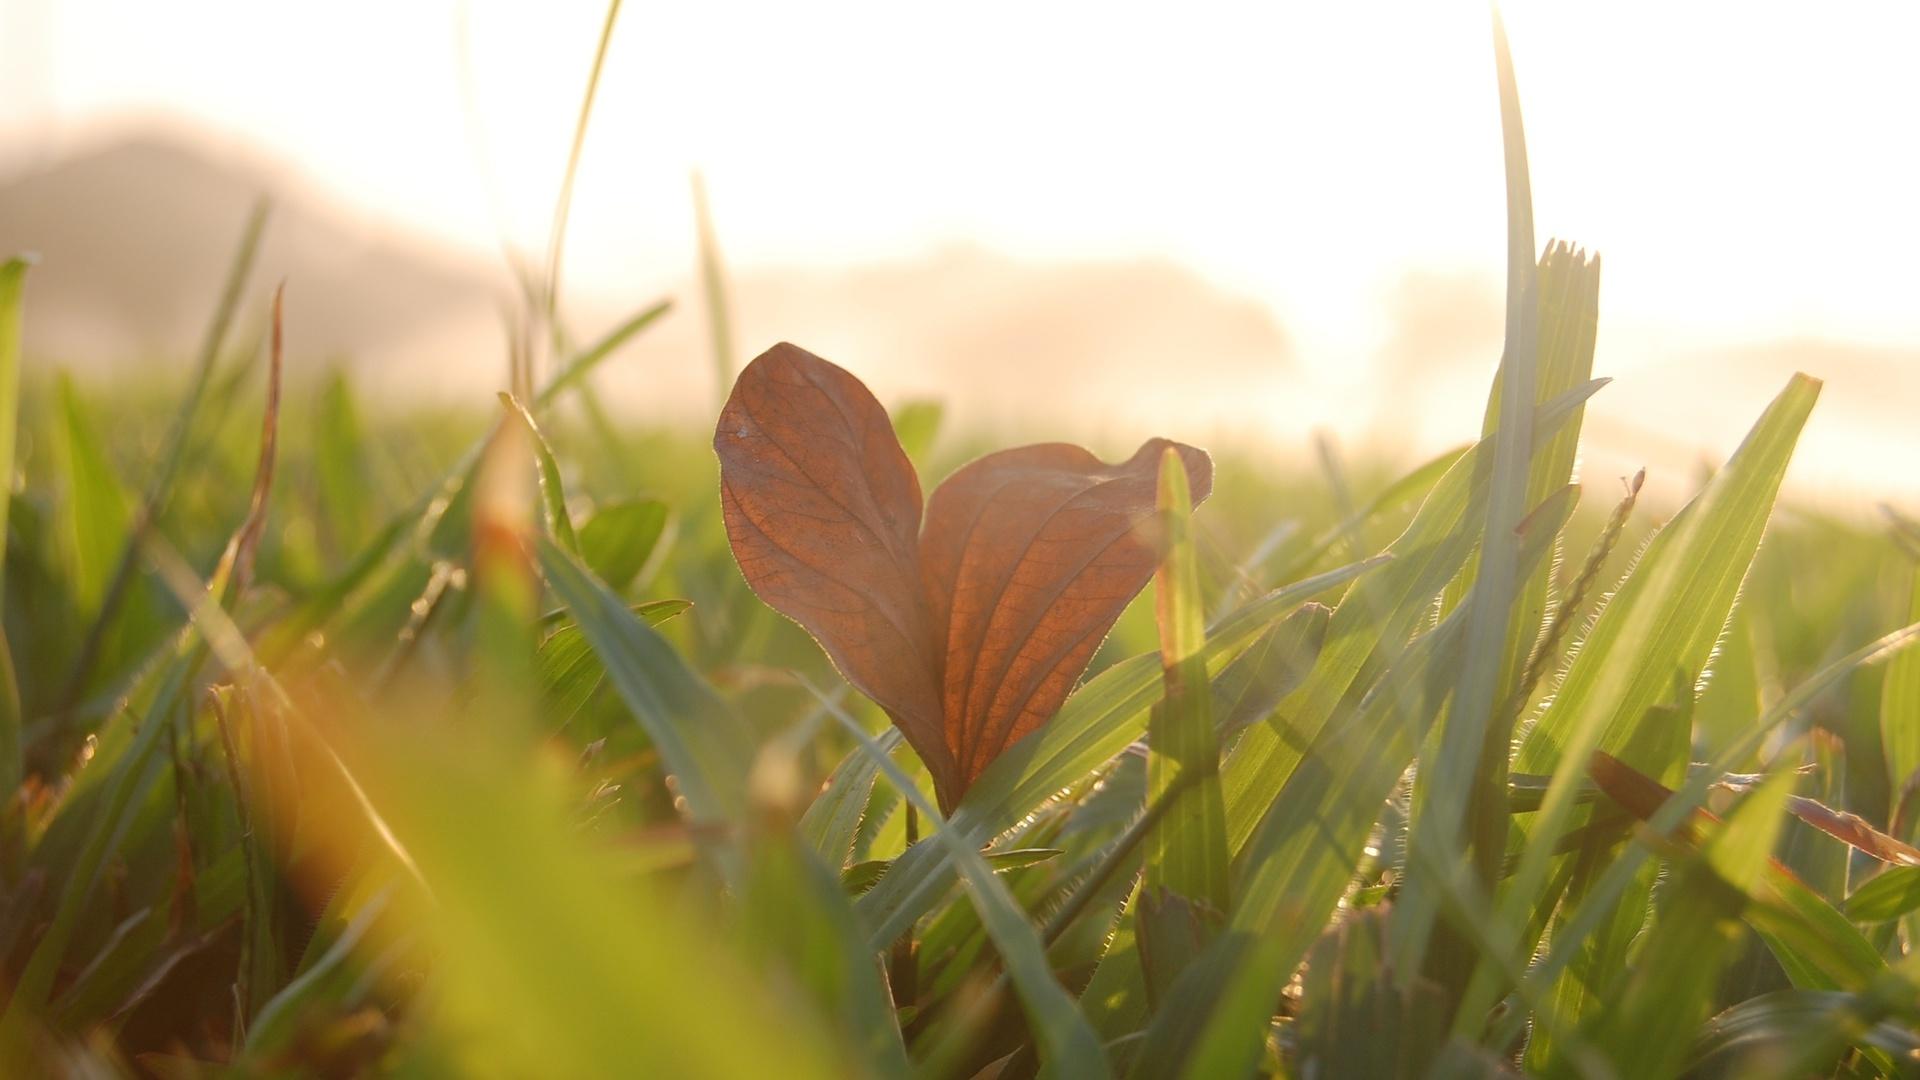 листочек, листик, Макро, leave, macro, трава, листик, зелень